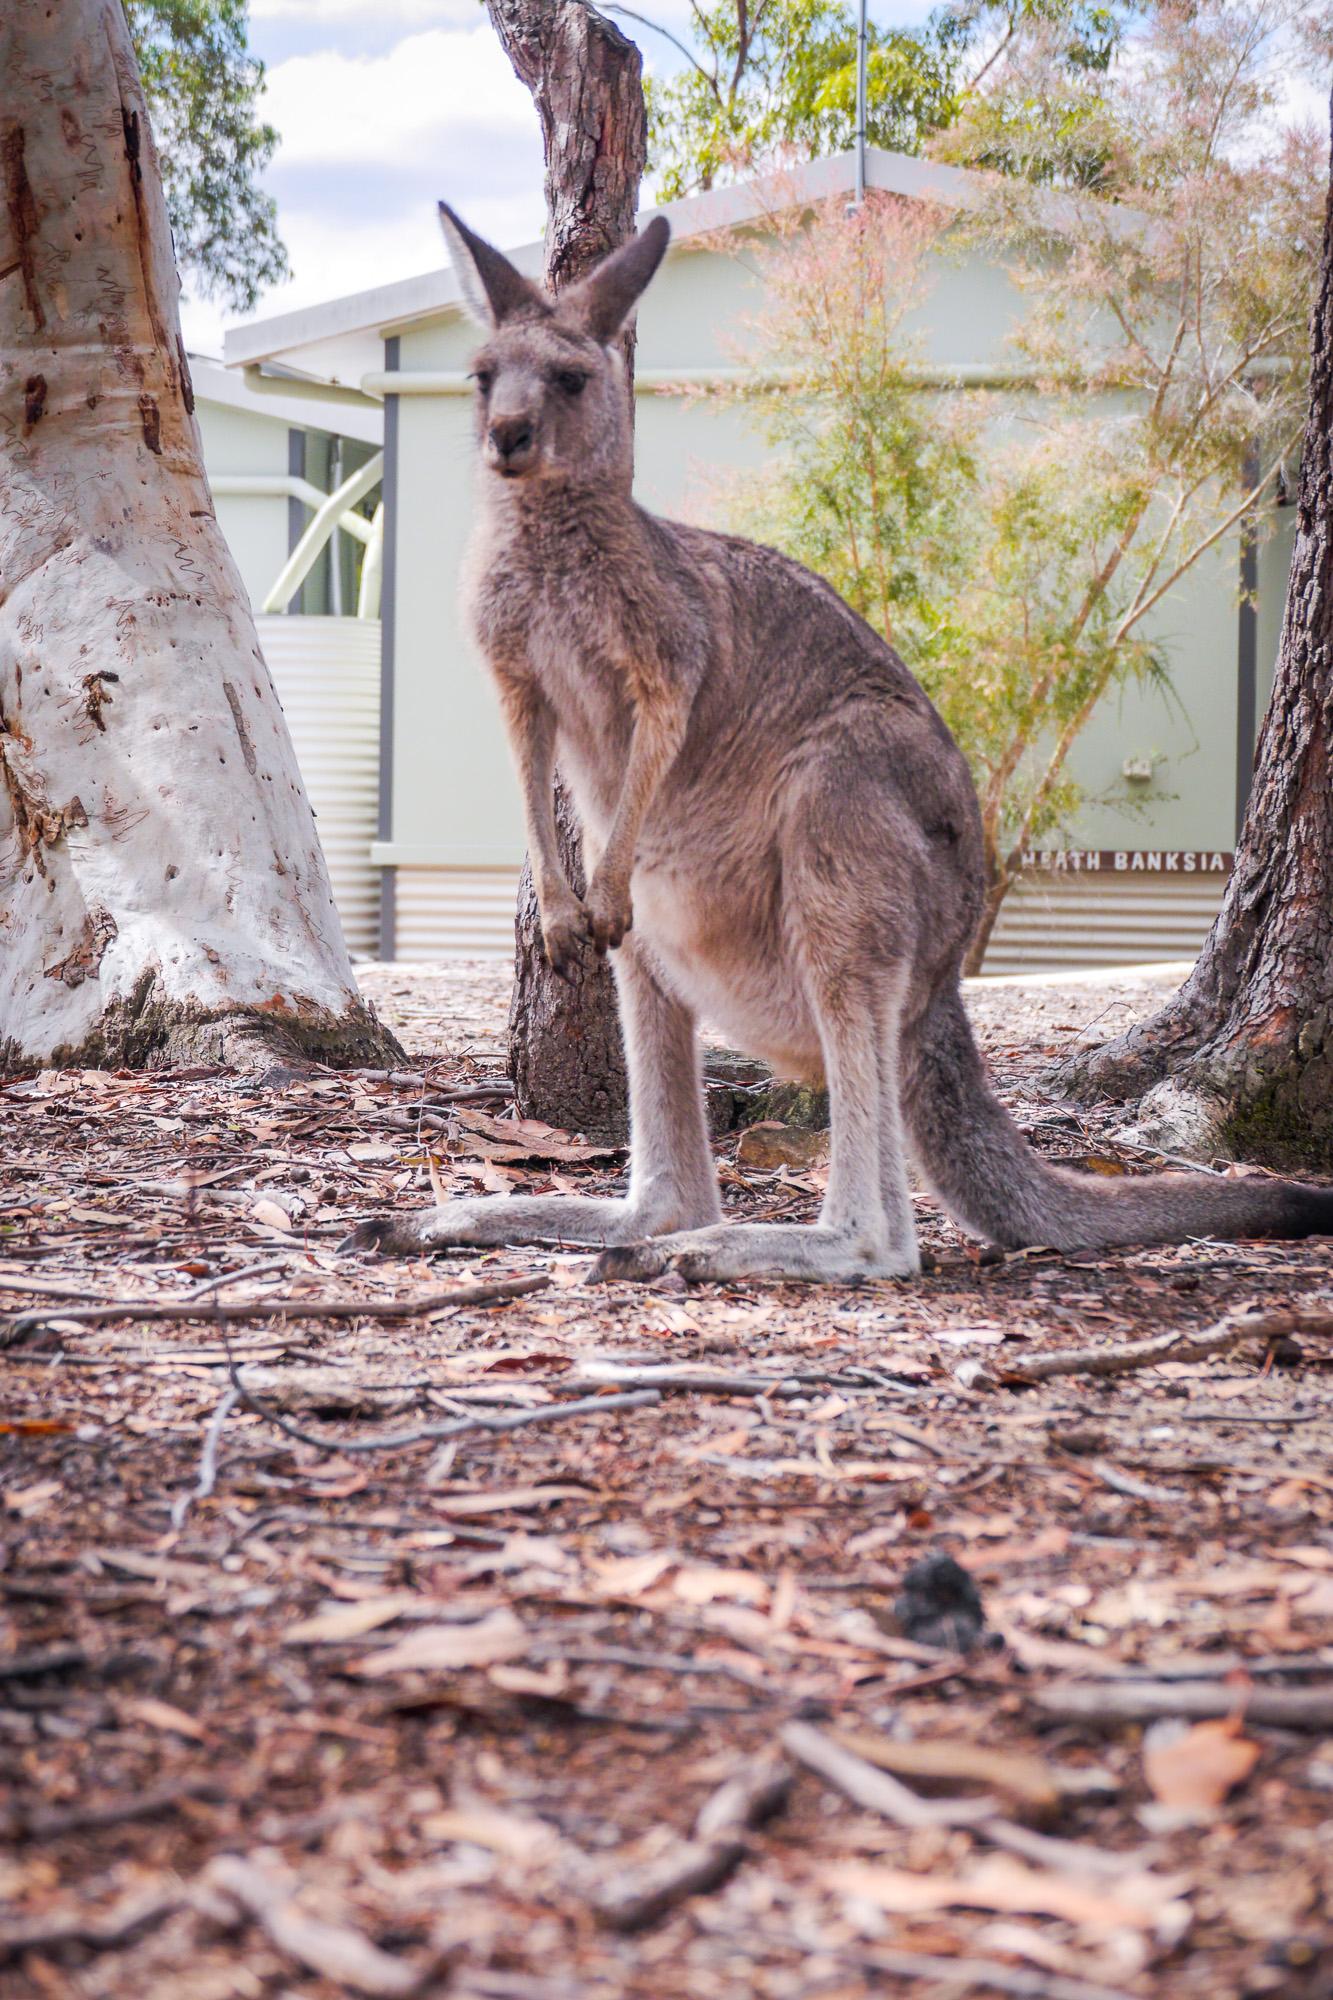 Walkabout, Australia